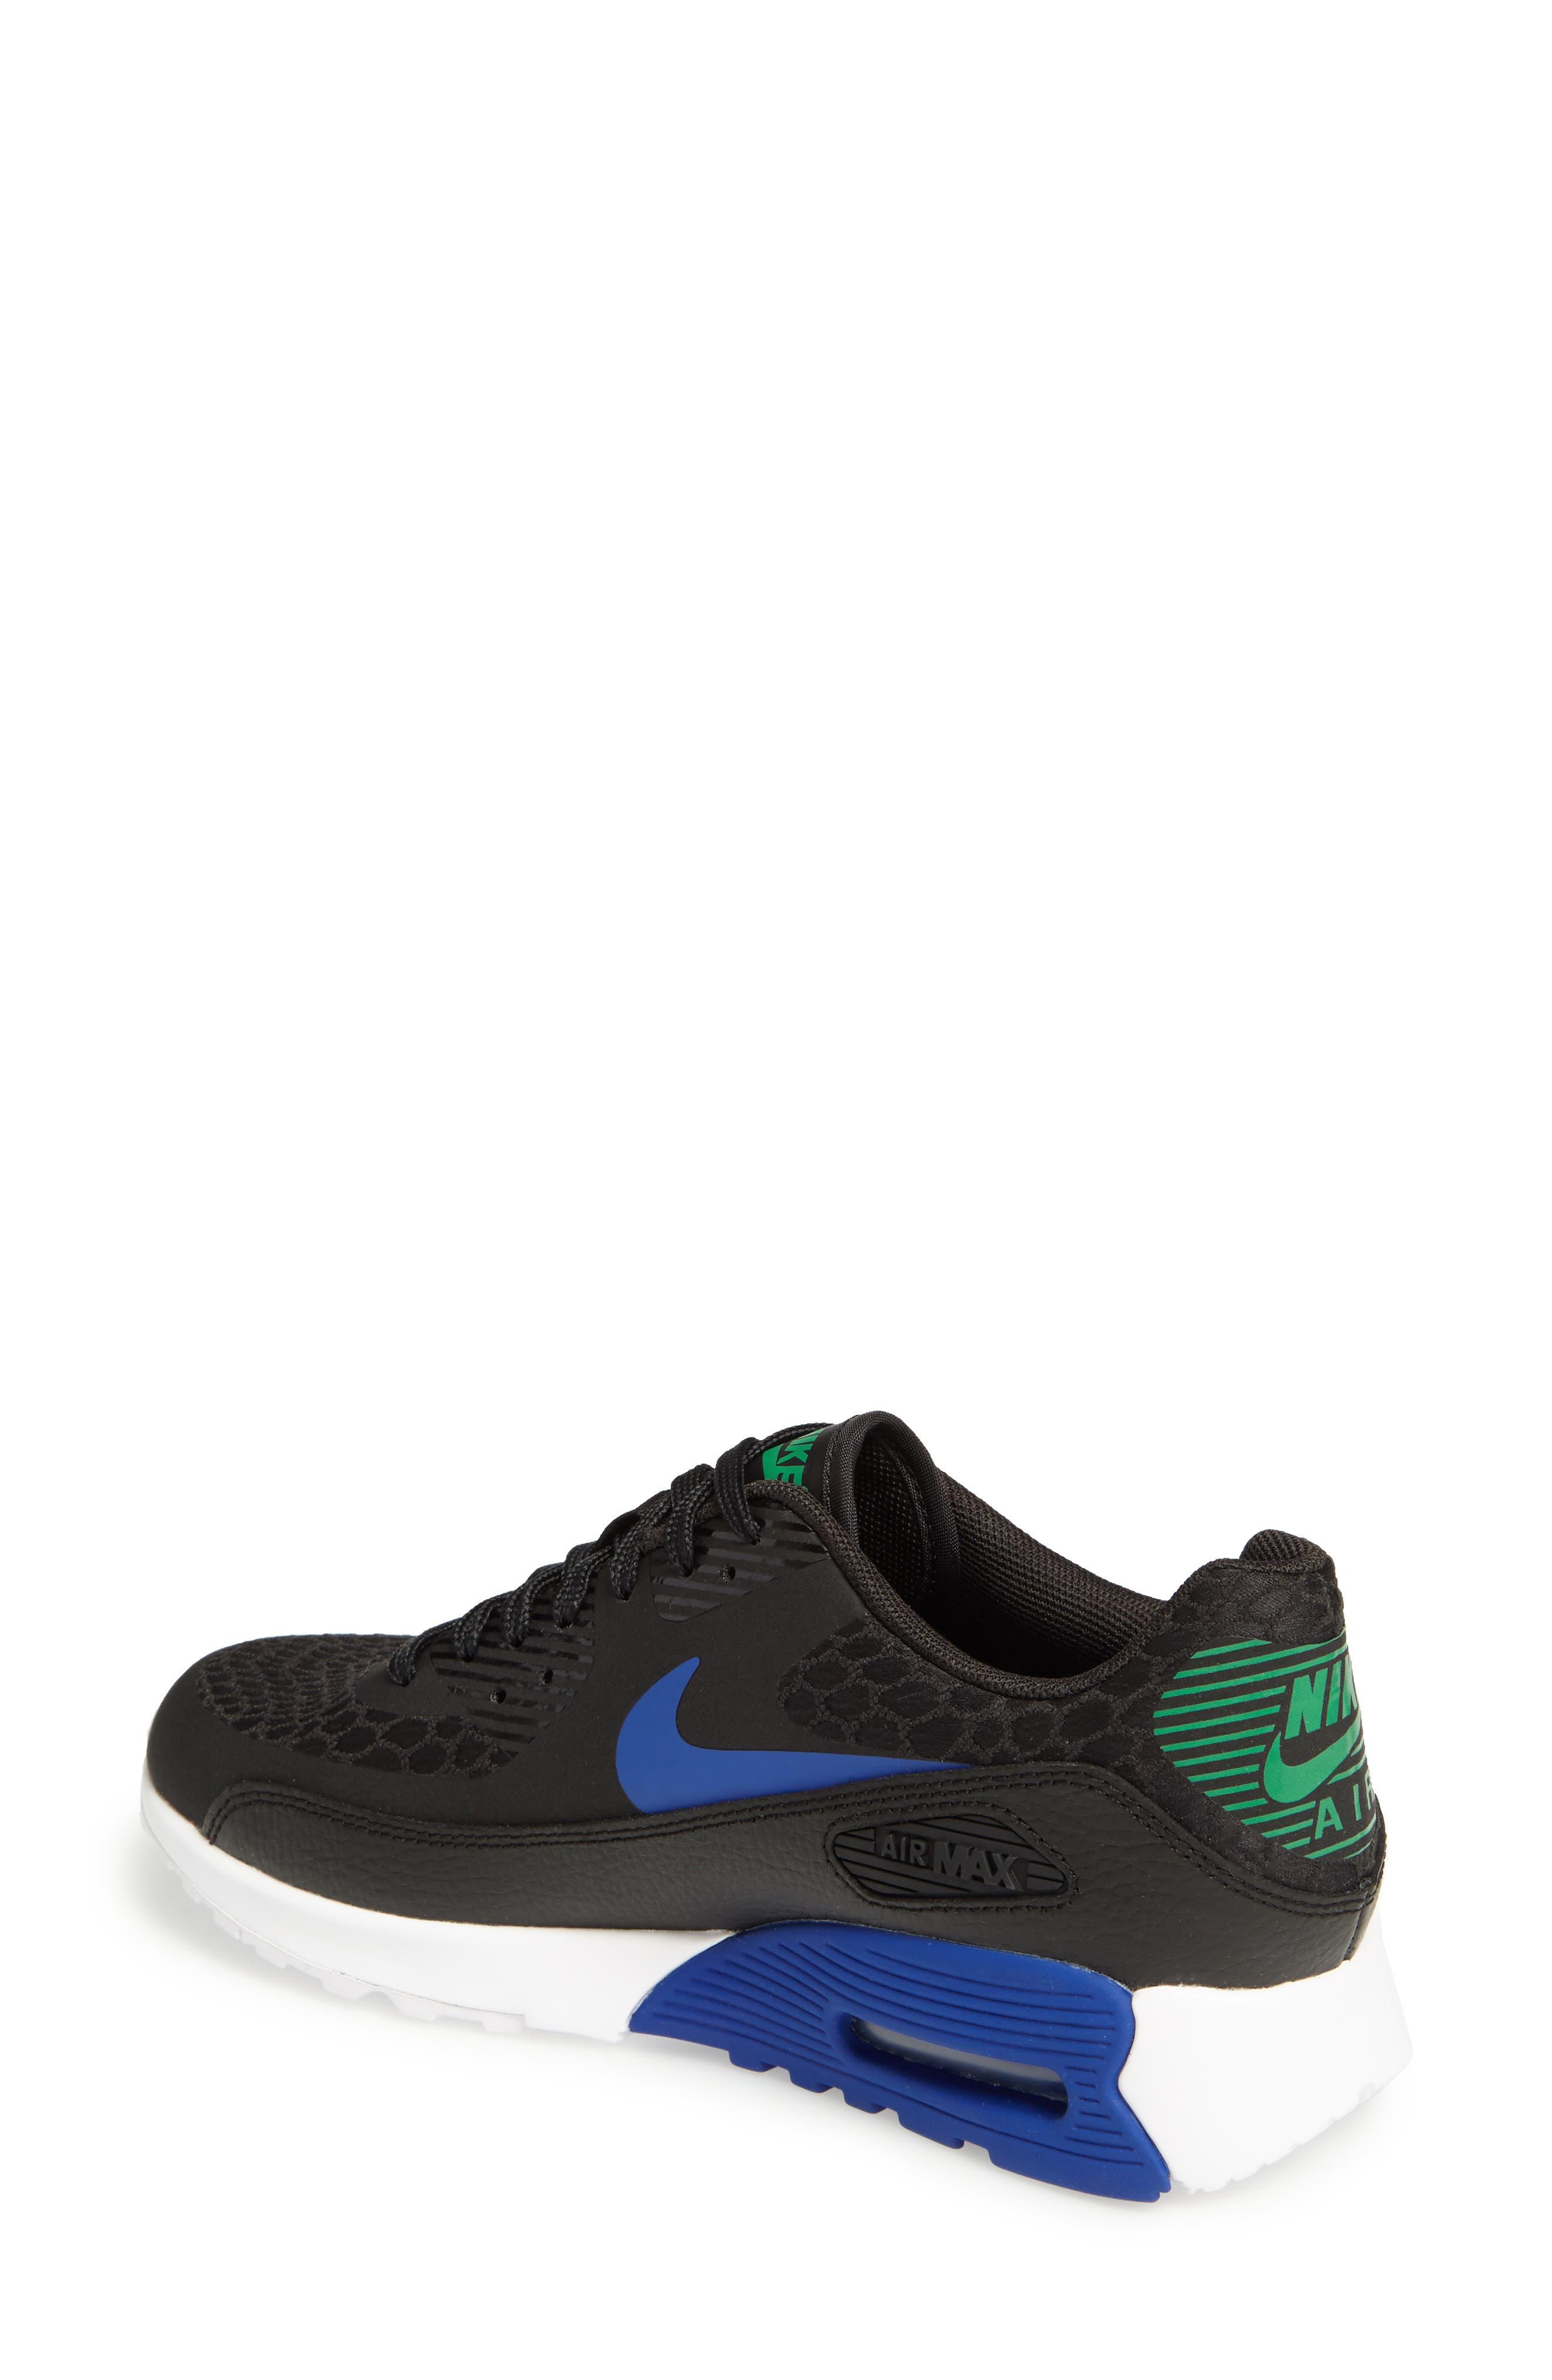 Air Max 90 Ultra 2.0 Sneaker,                             Alternate thumbnail 2, color,                             001